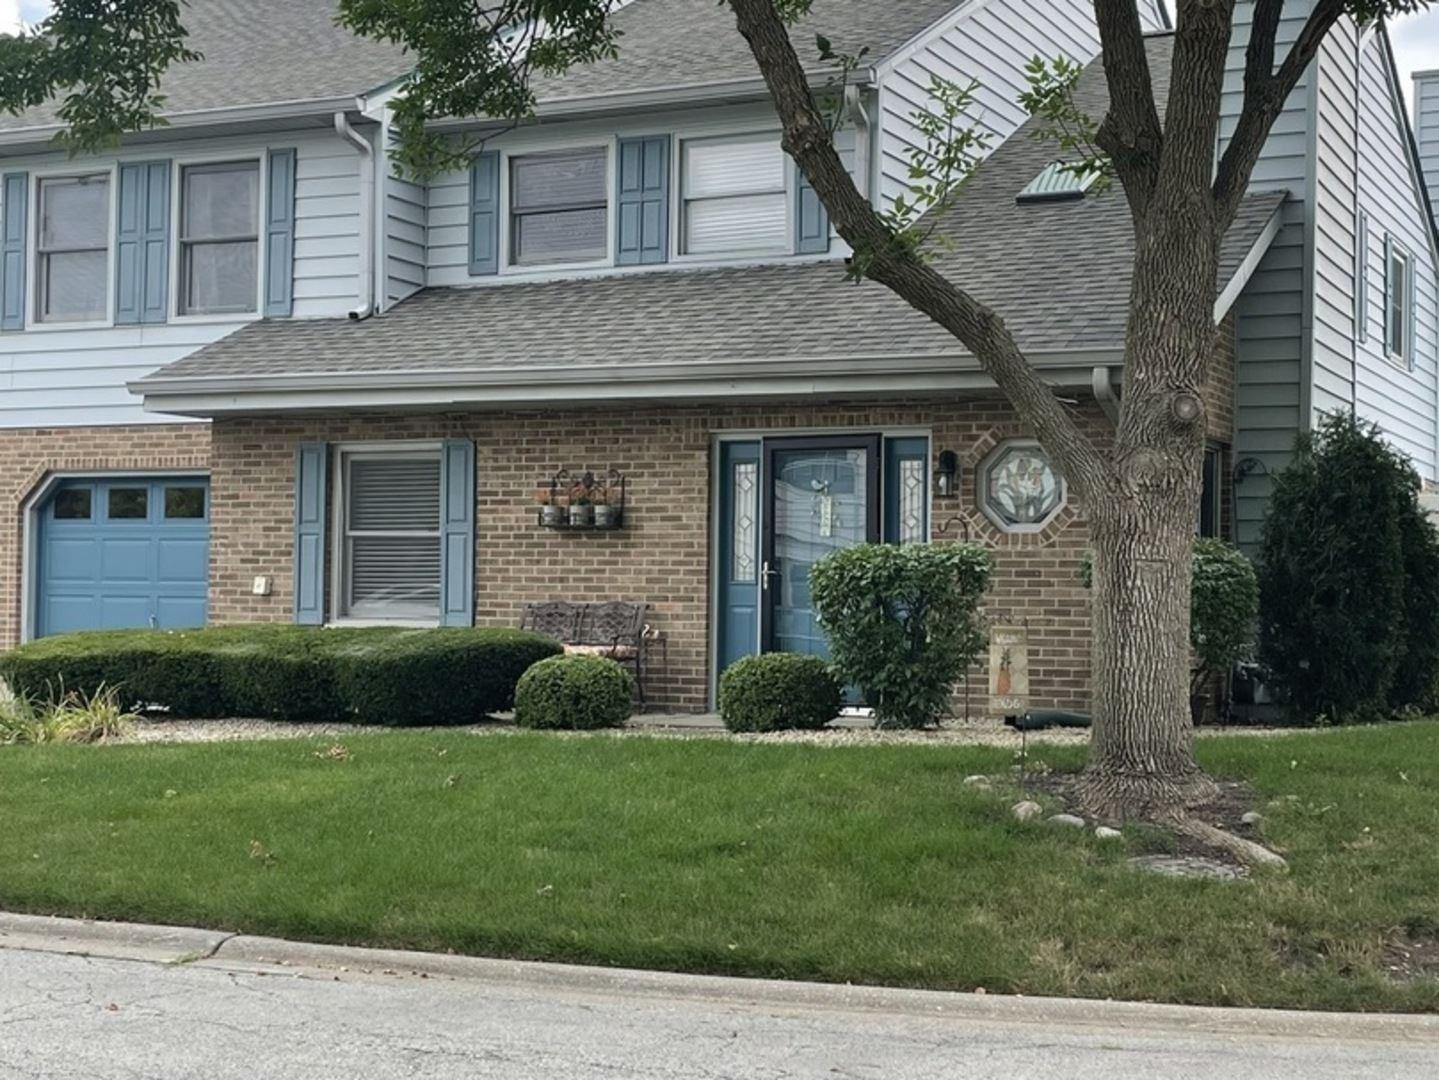 15703 Danford Lane, Orland Park, IL 60462 - #: 11227515